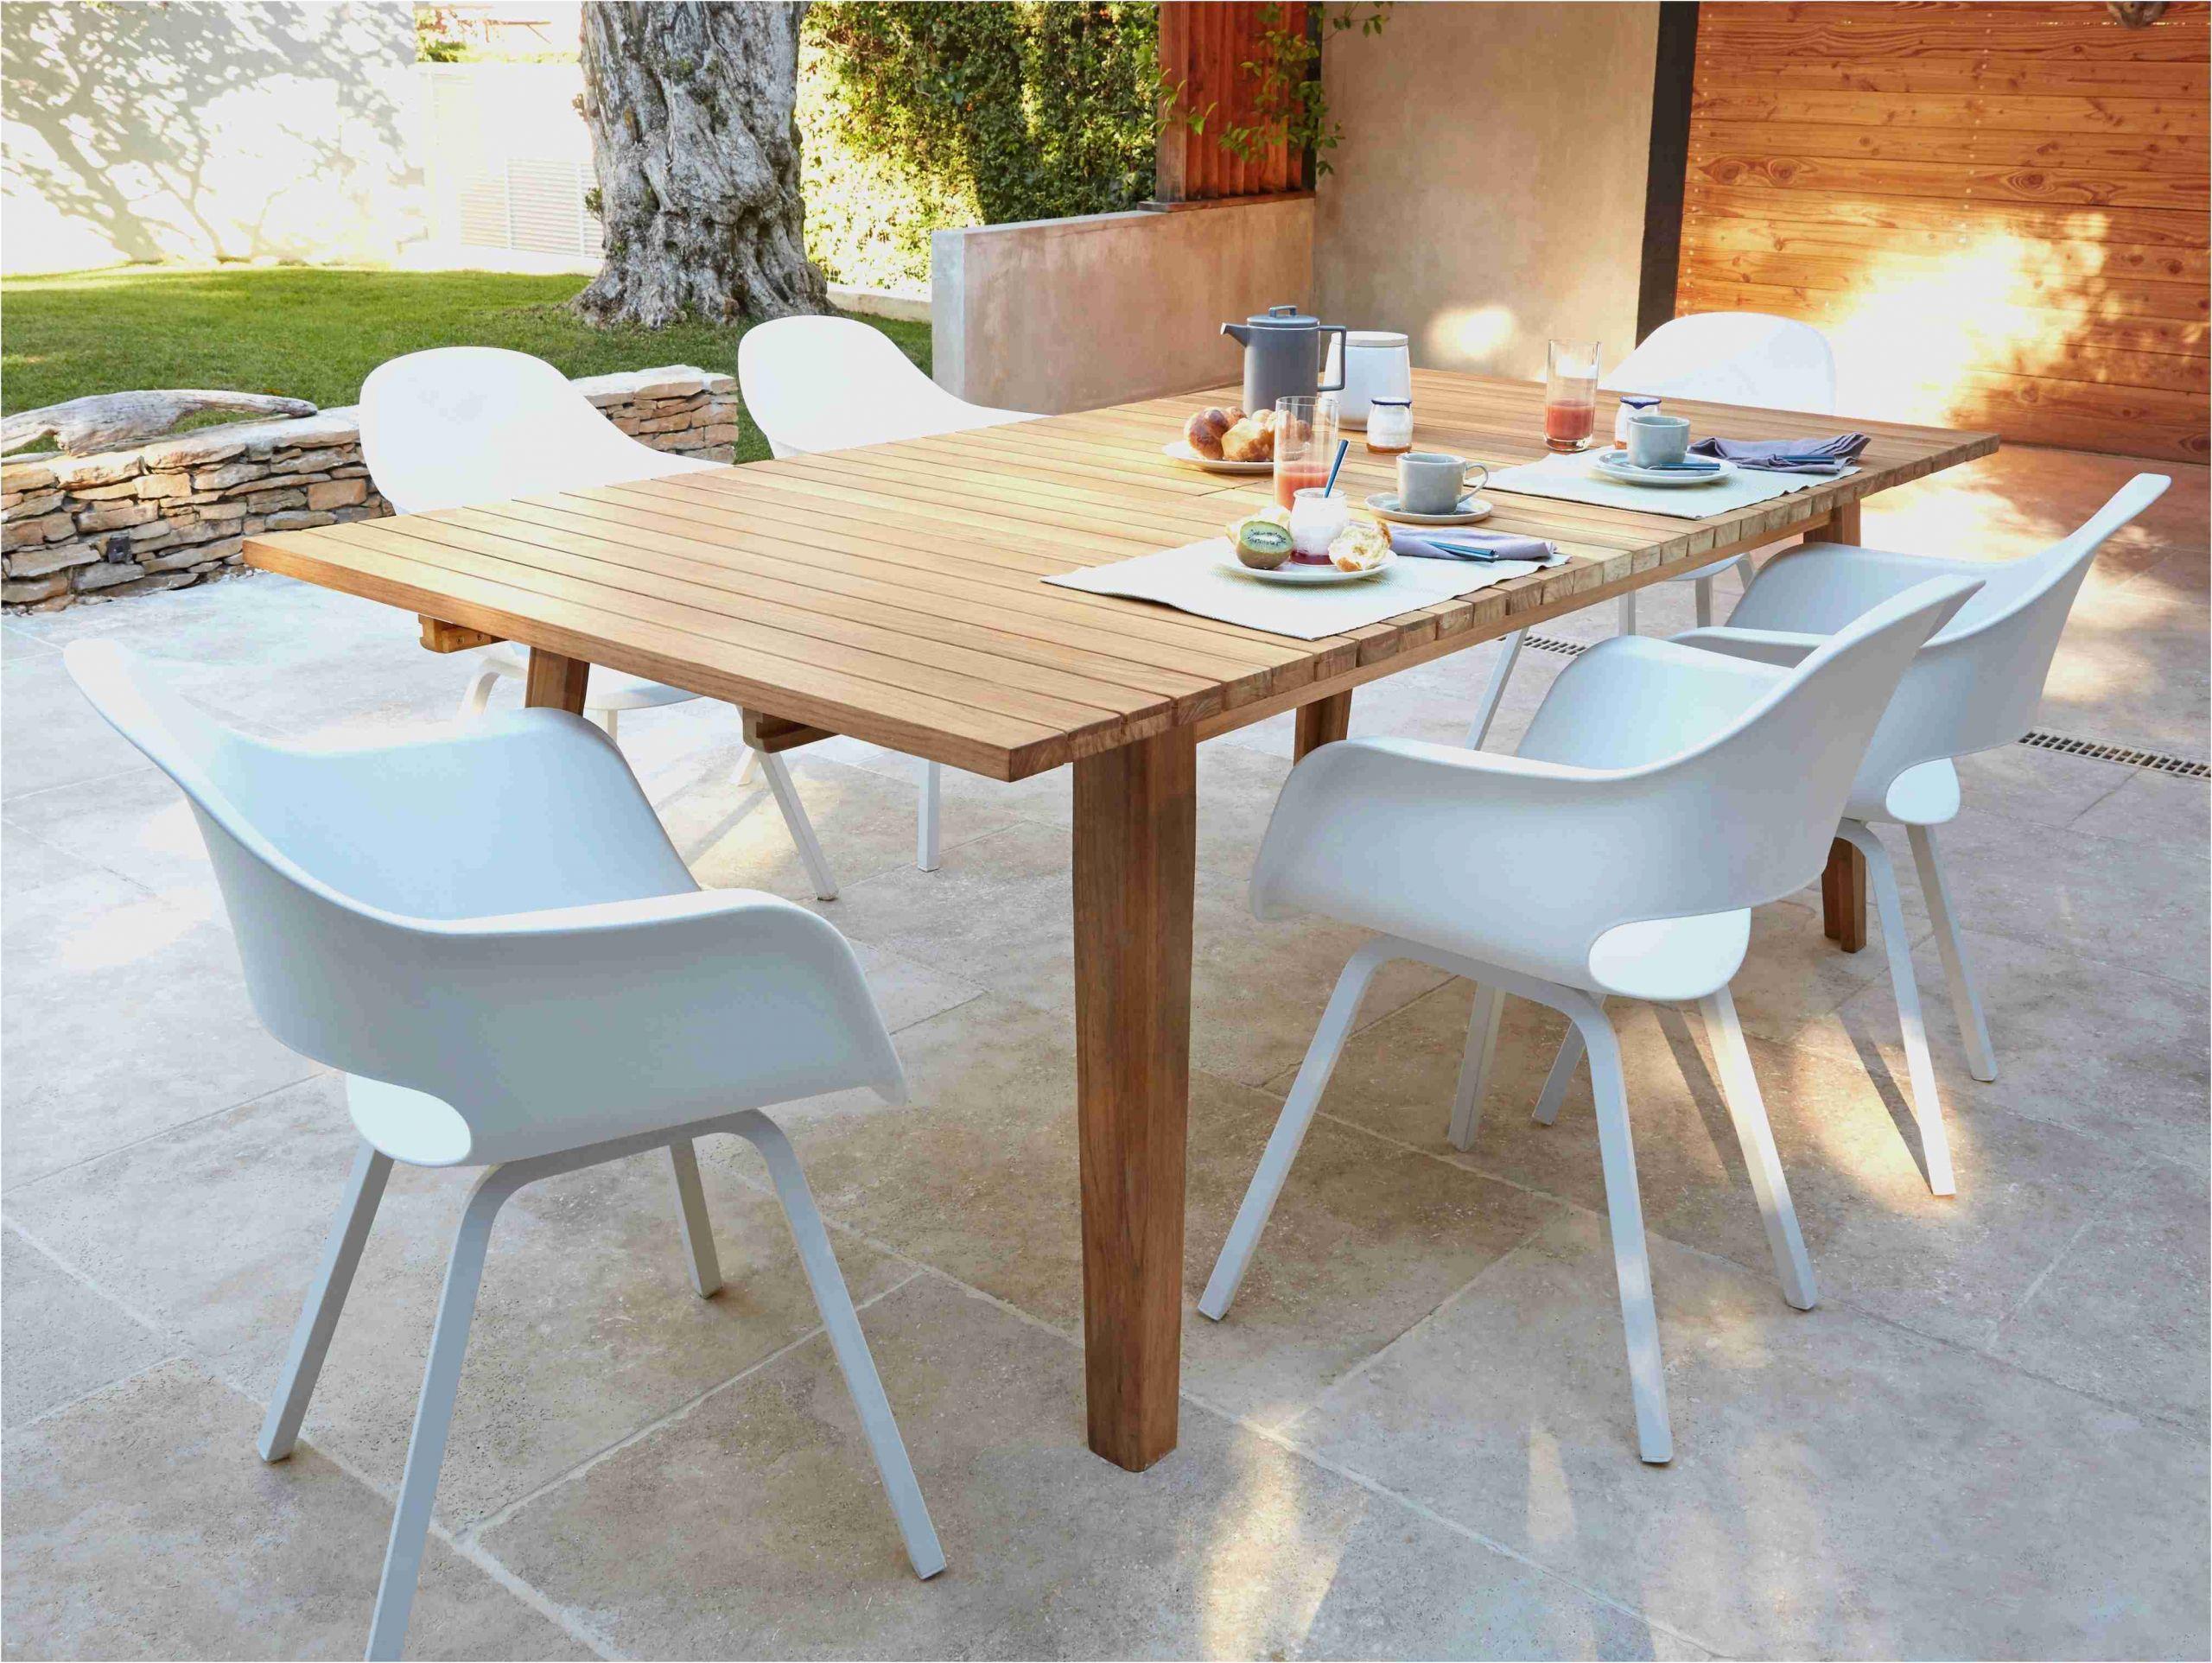 Table Haute Cuisine Alinea chaise bistrot alinea unique chaise haute cuisine alinea